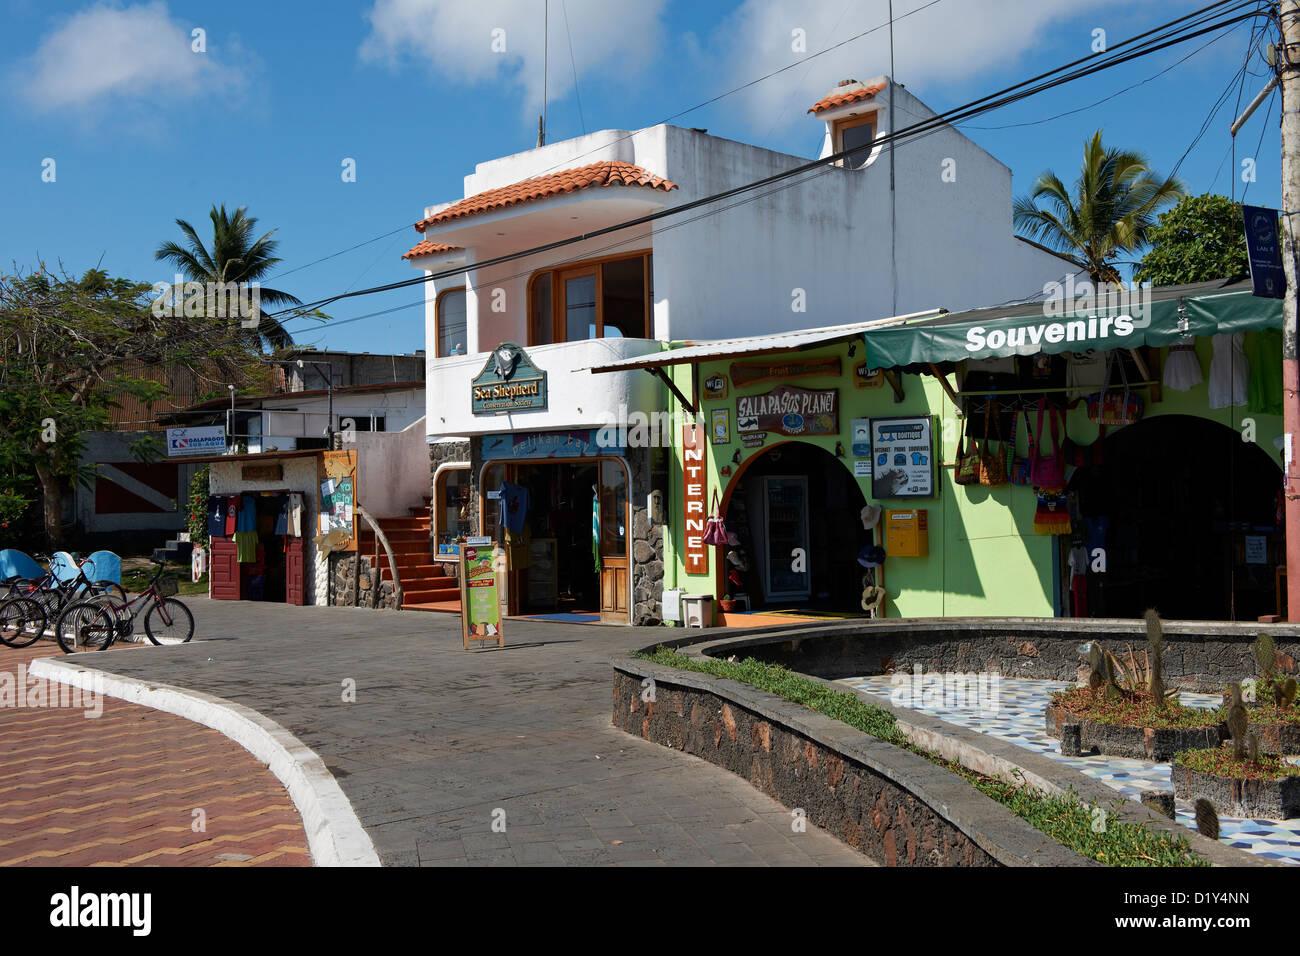 Puerto Ayora, Santa Cruz, Galapagos Islands, Ecuador - Stock Image